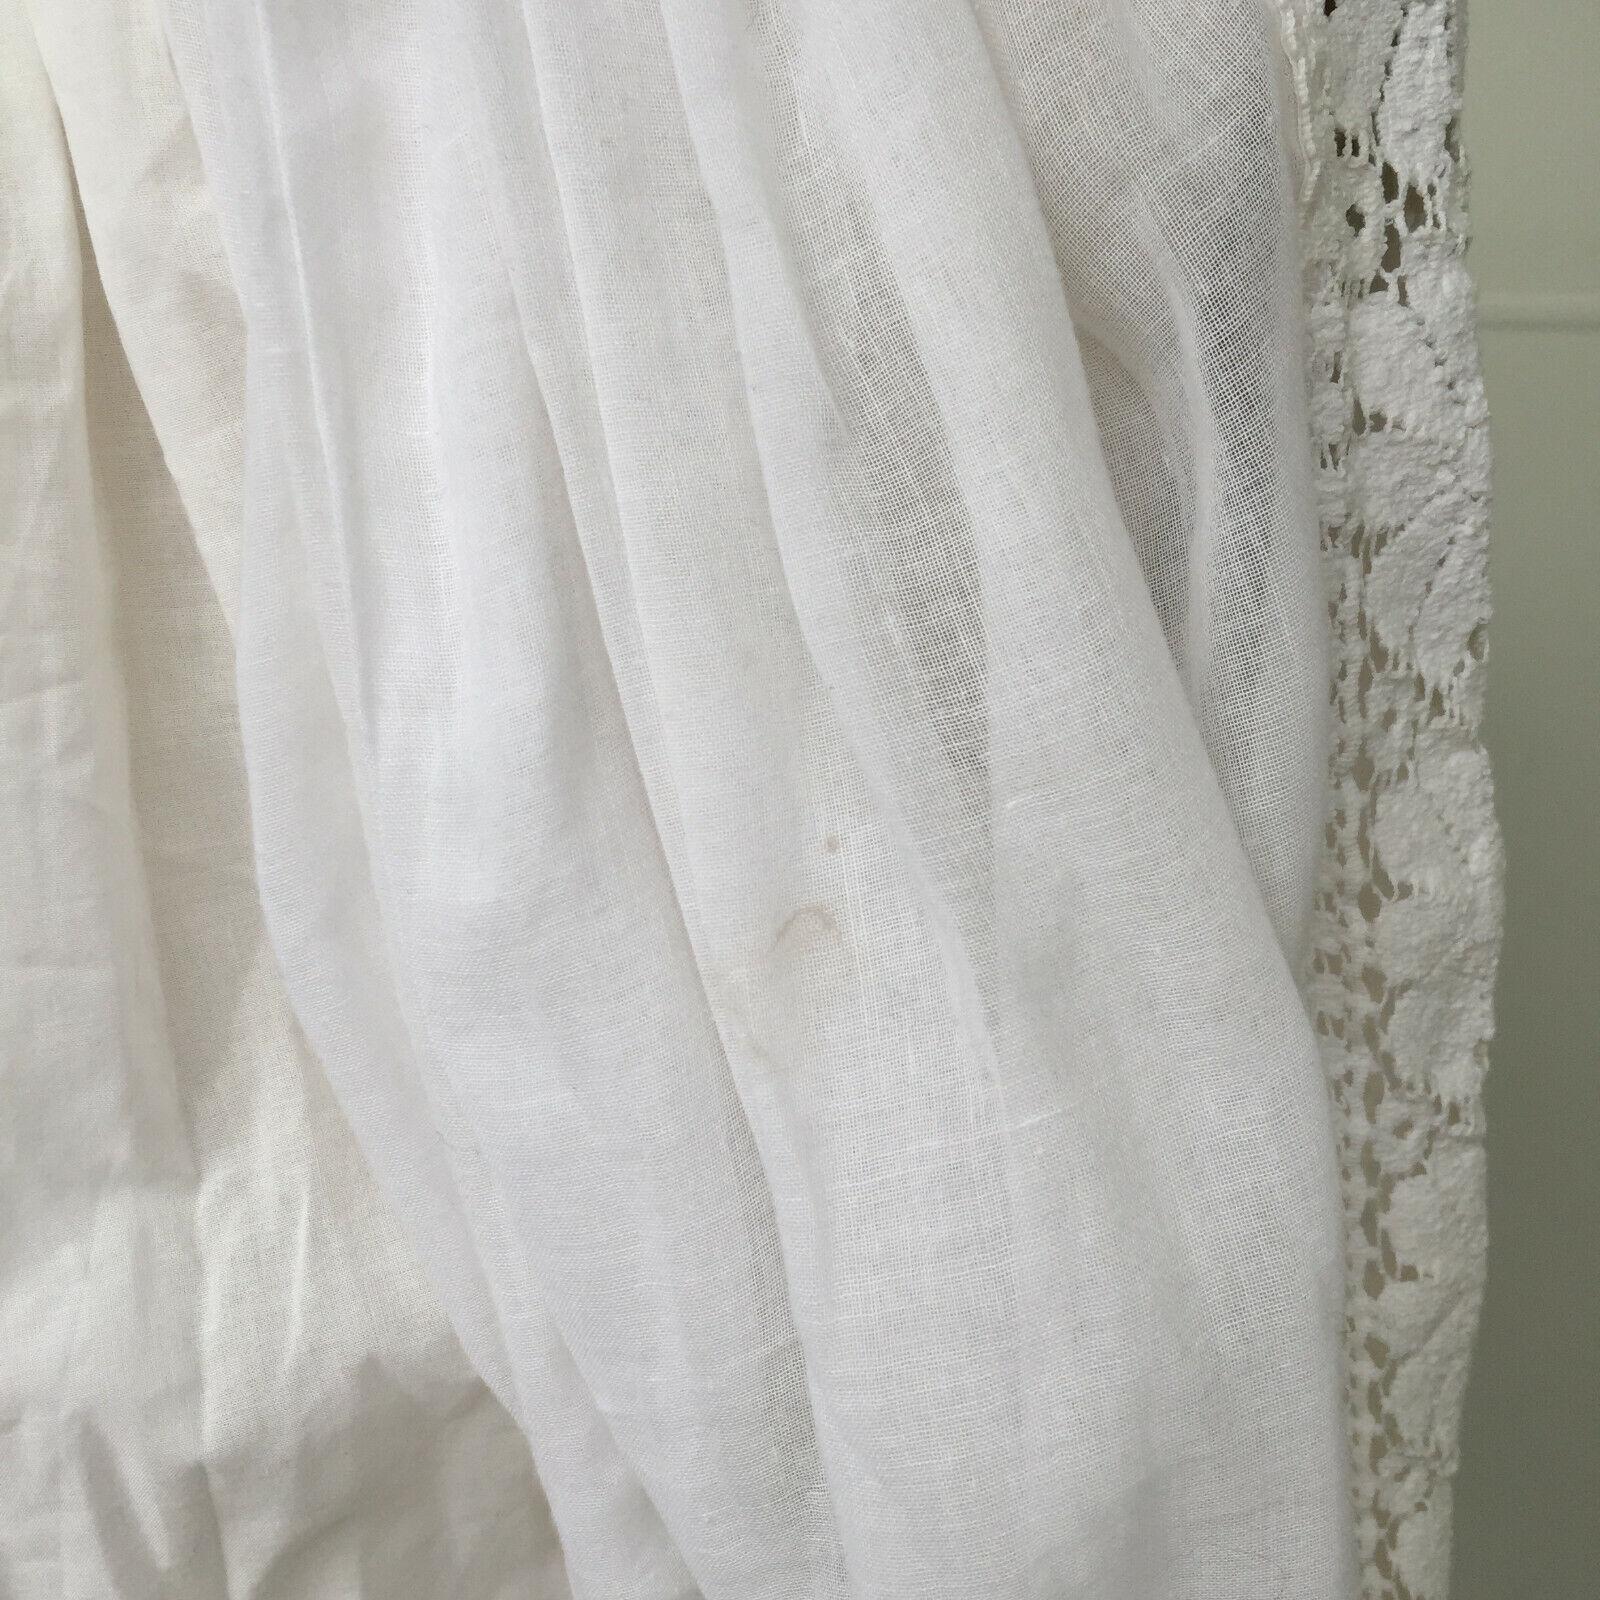 VTG 1970s Hungarian Handmade Textured Boho-Chic P… - image 9